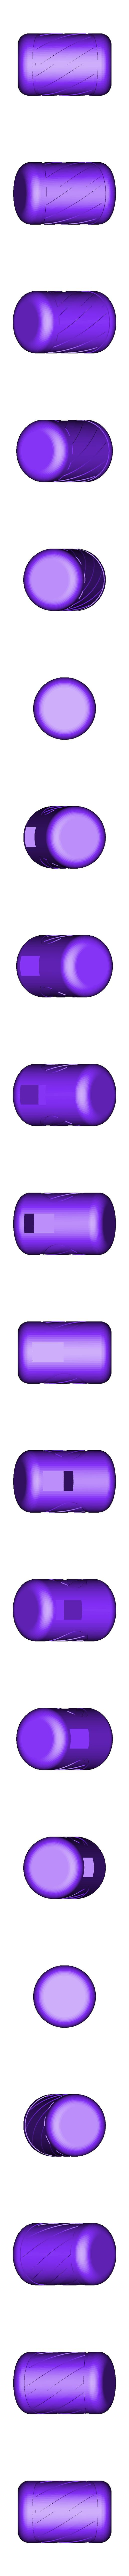 throttle_knob.stl Download free STL file Joystick PS4 • 3D print object, Osichan